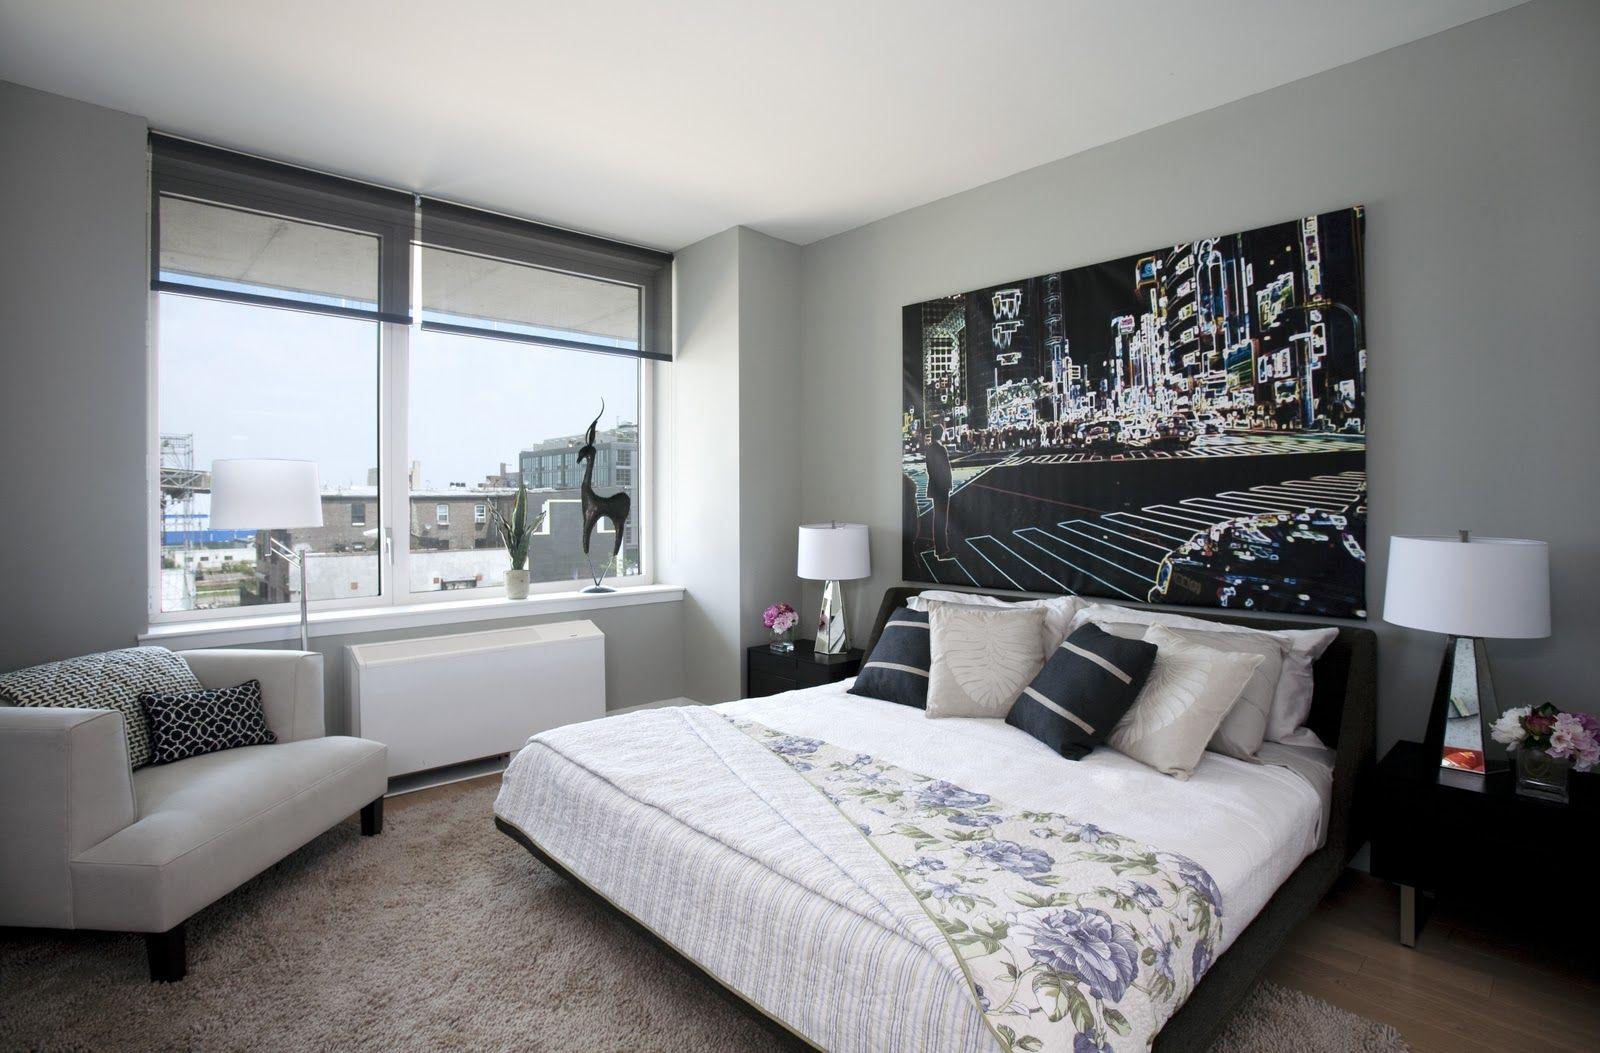 Master bedroom grey  bedroom ideas grey and white  Bedroom  Pinterest  Master bedroom